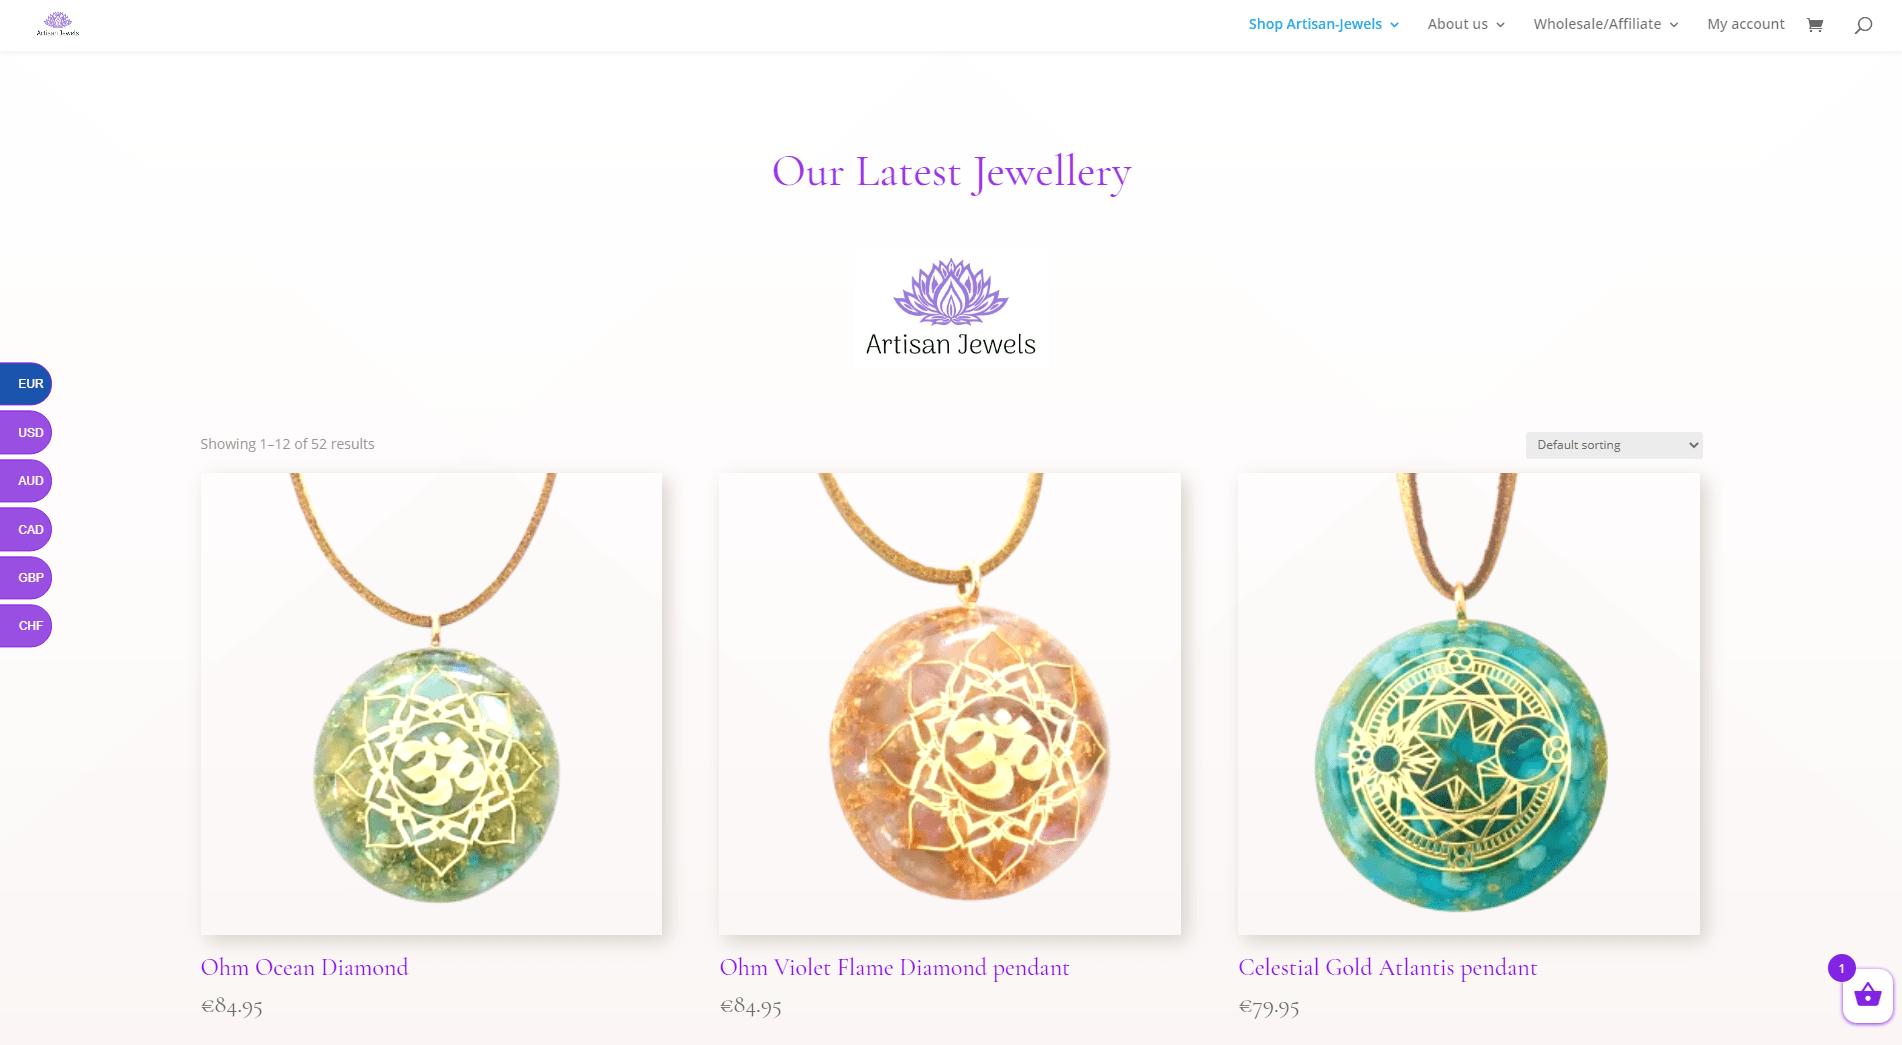 Webwinkel: Artisan-jewels.com